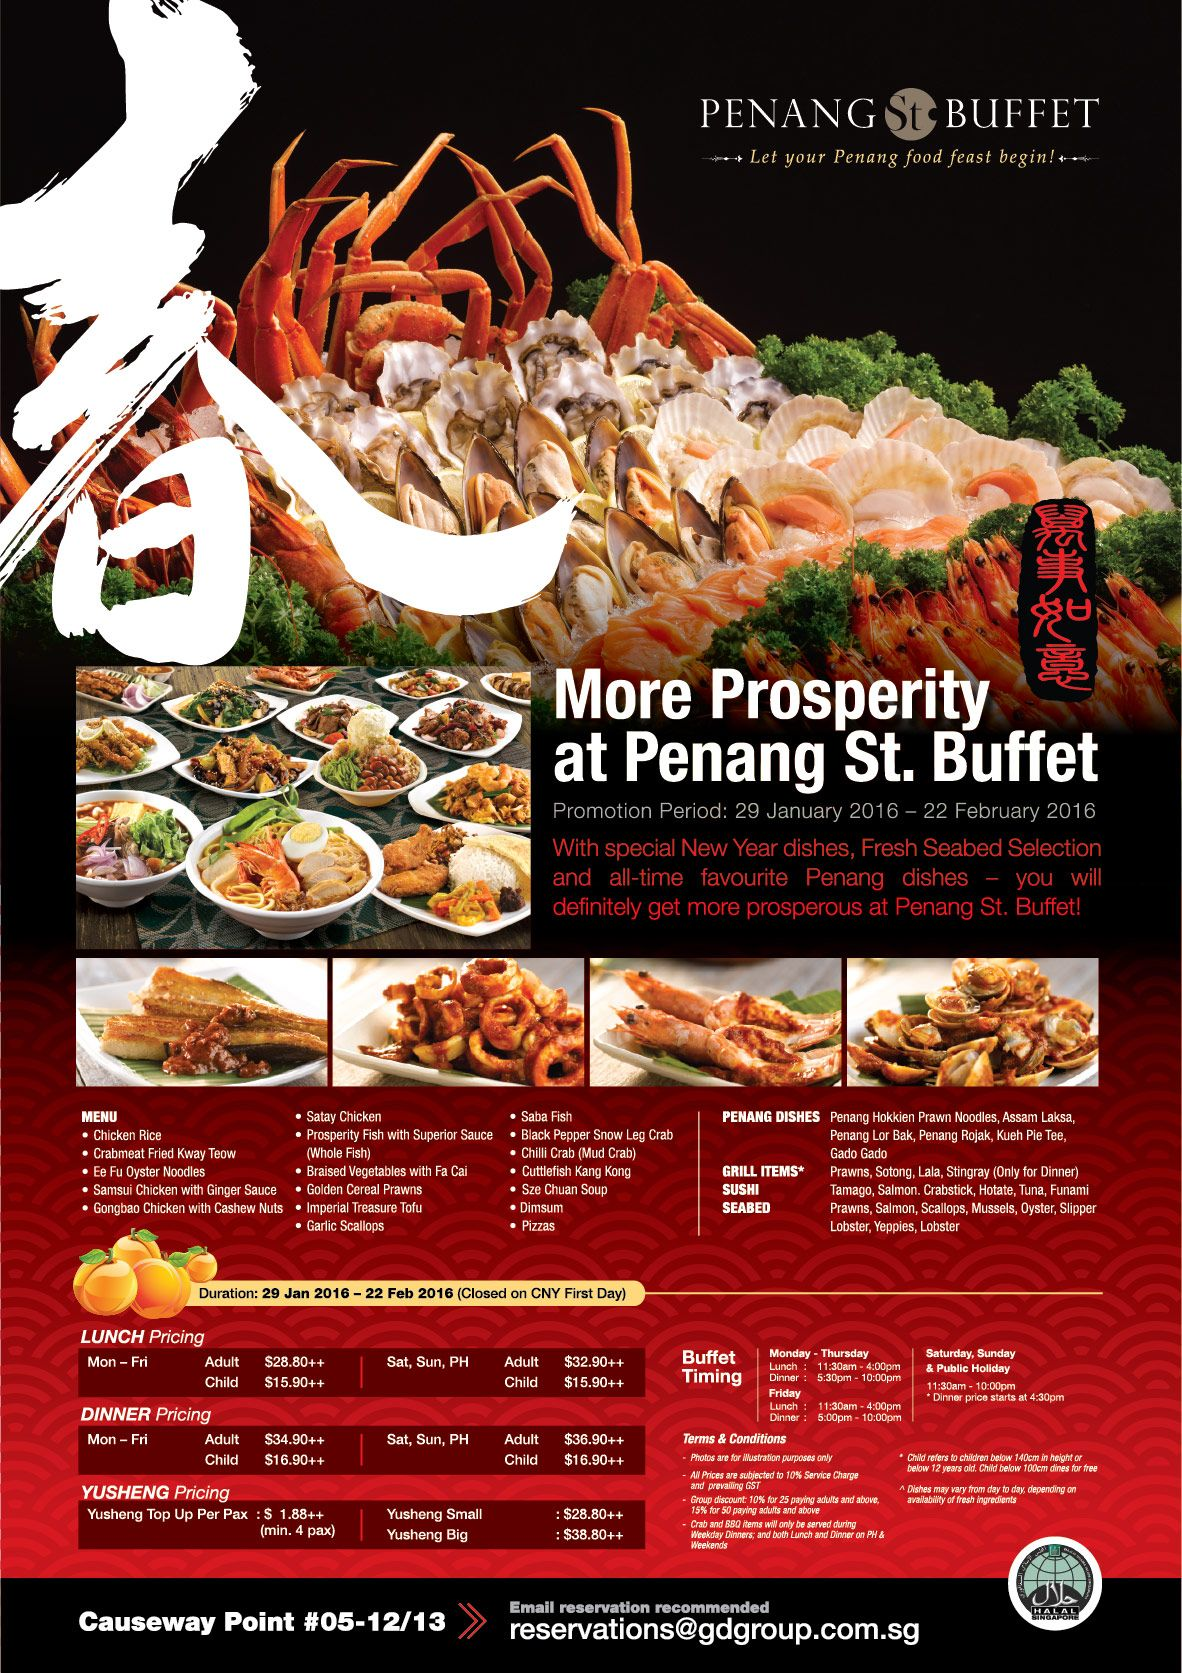 Penang St Buffet S Chinese New Year Menu New Year Menu Chinese New Year Dishes Buffet